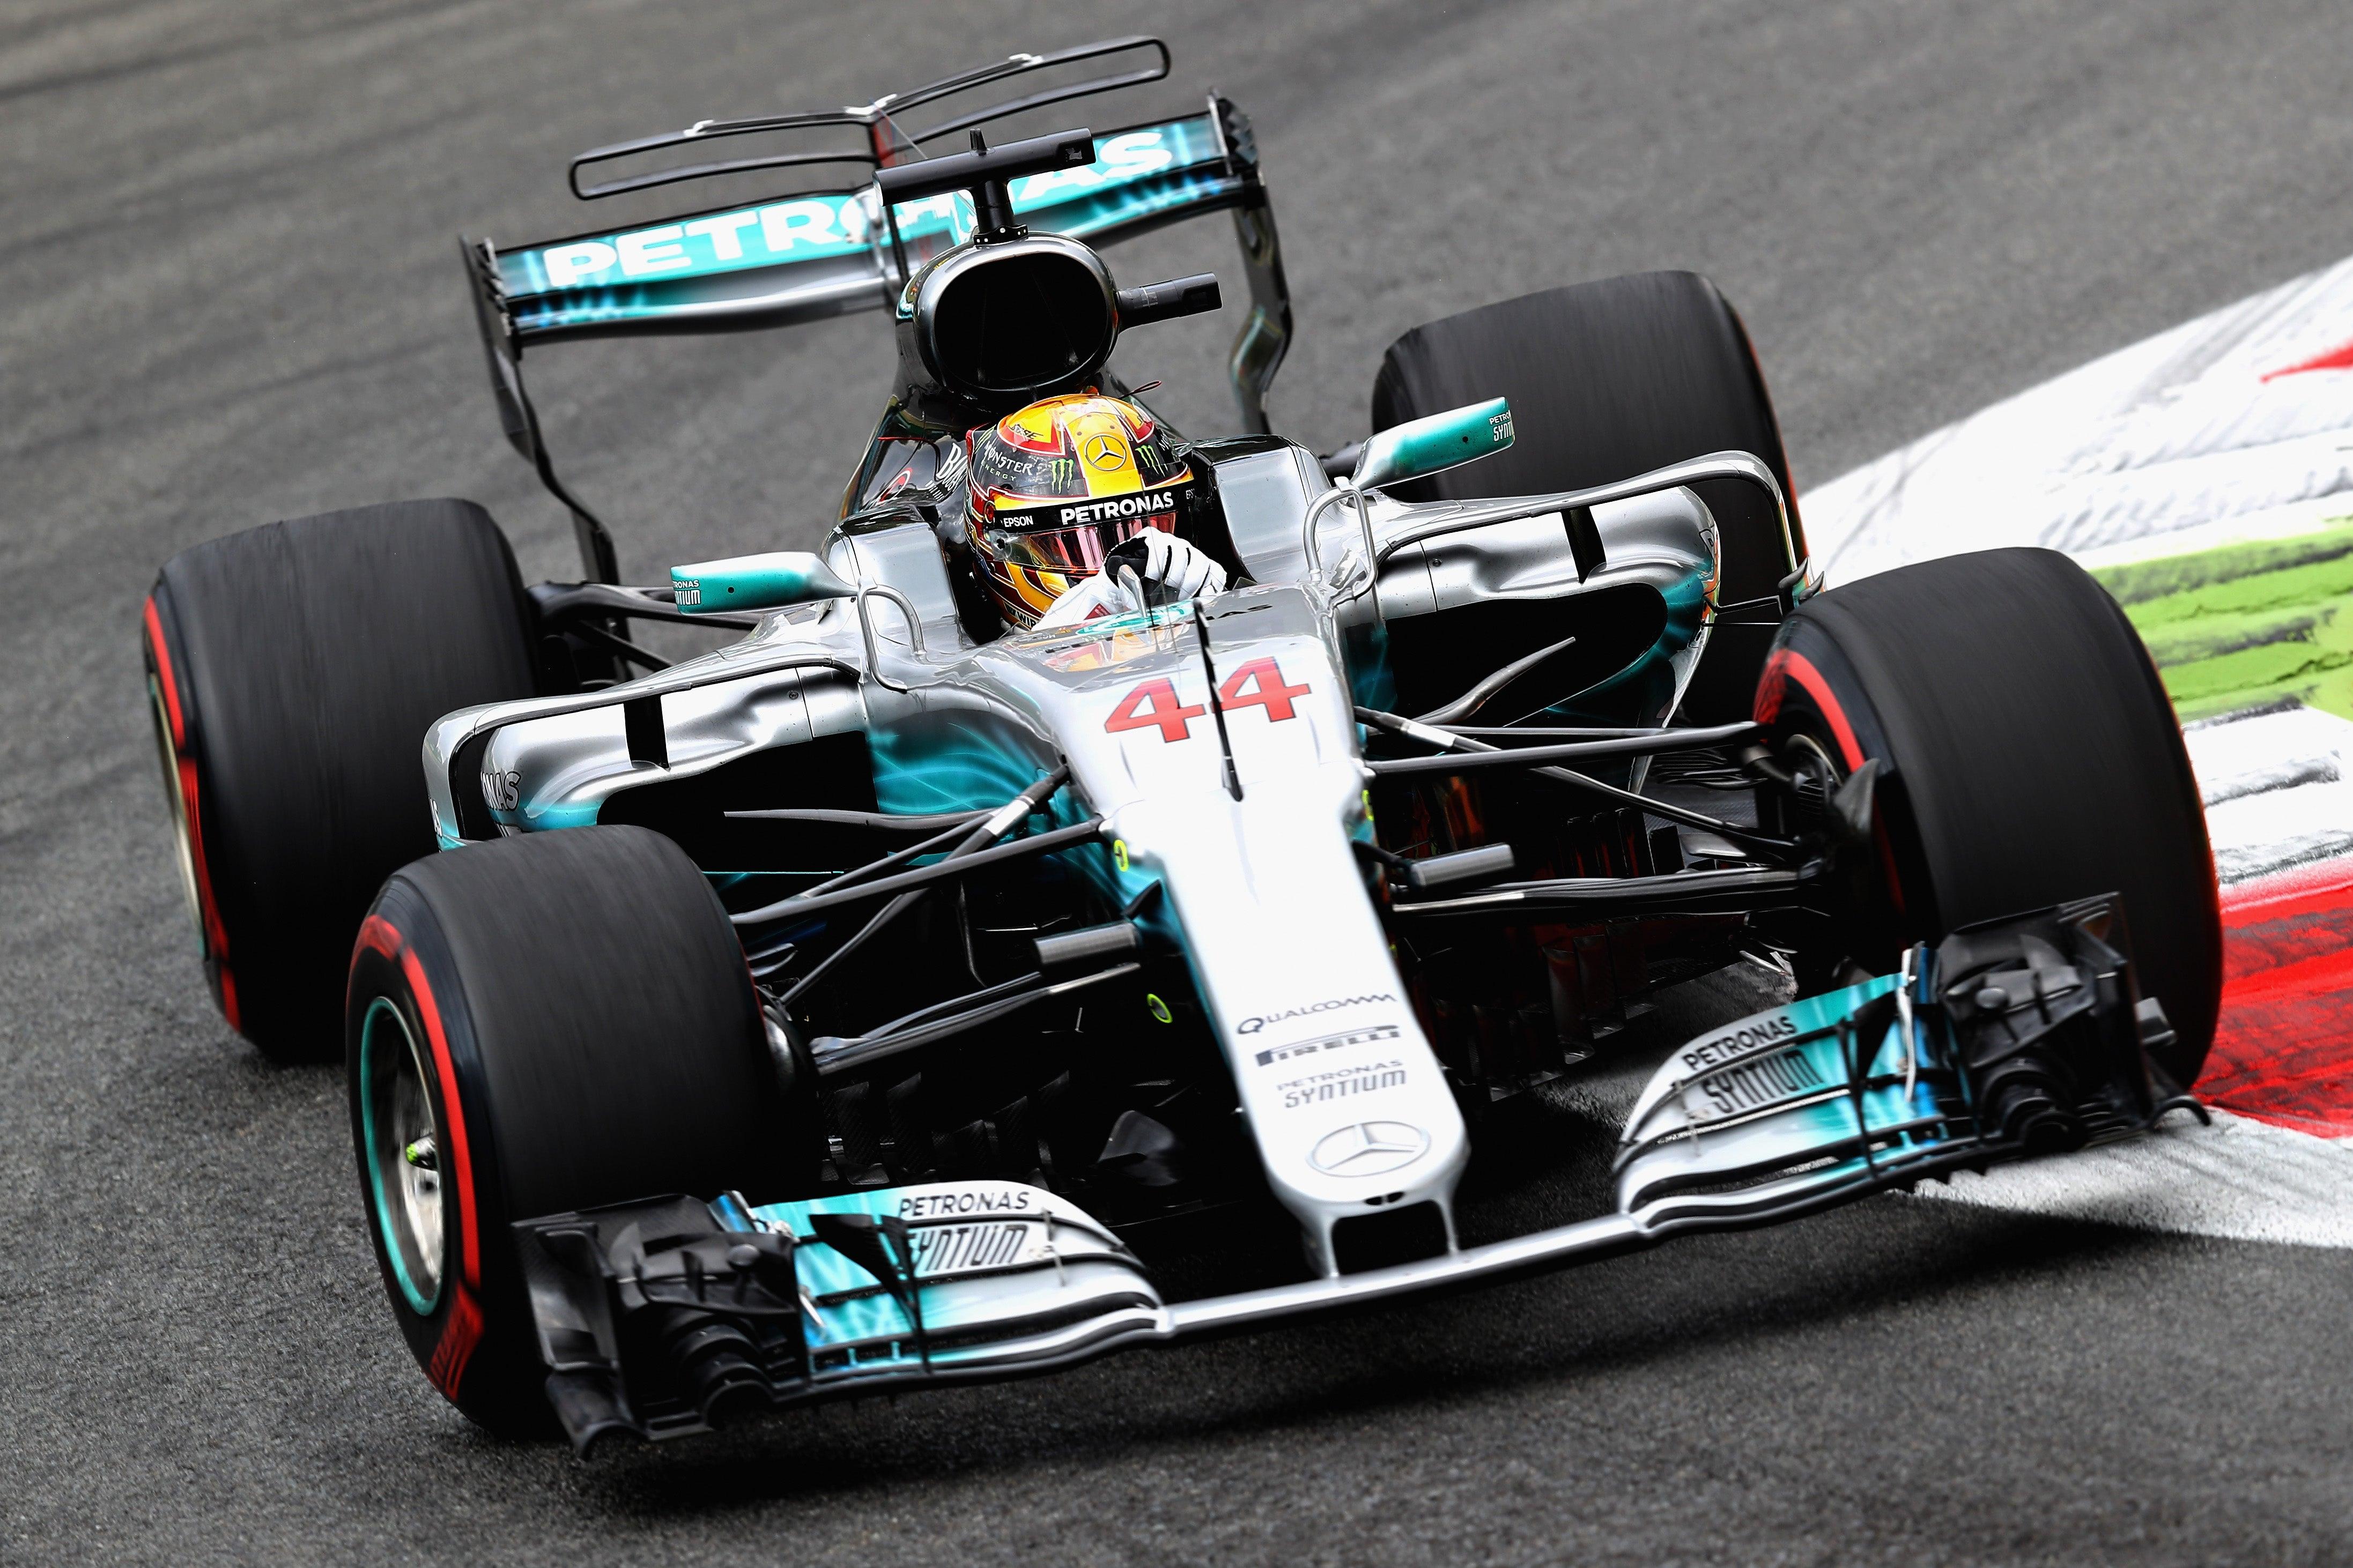 Monza Formula One Winner Lewis Hamilton Booed For Not Driving A Ferrari